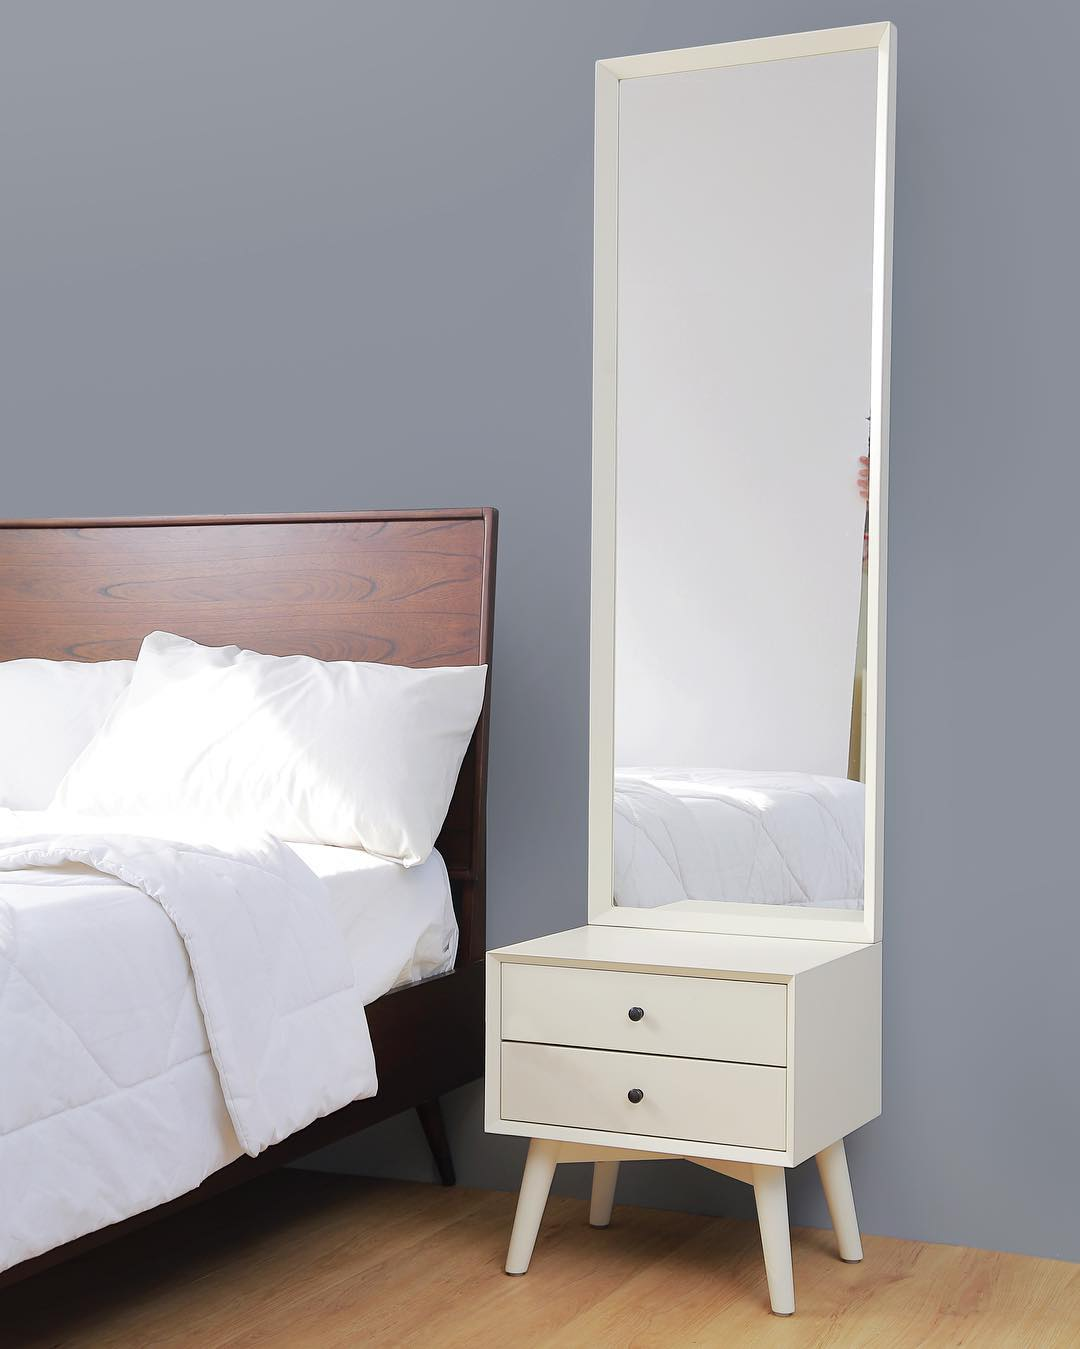 Meja Kamar Tidur Minimalis Tempat Rias Modern